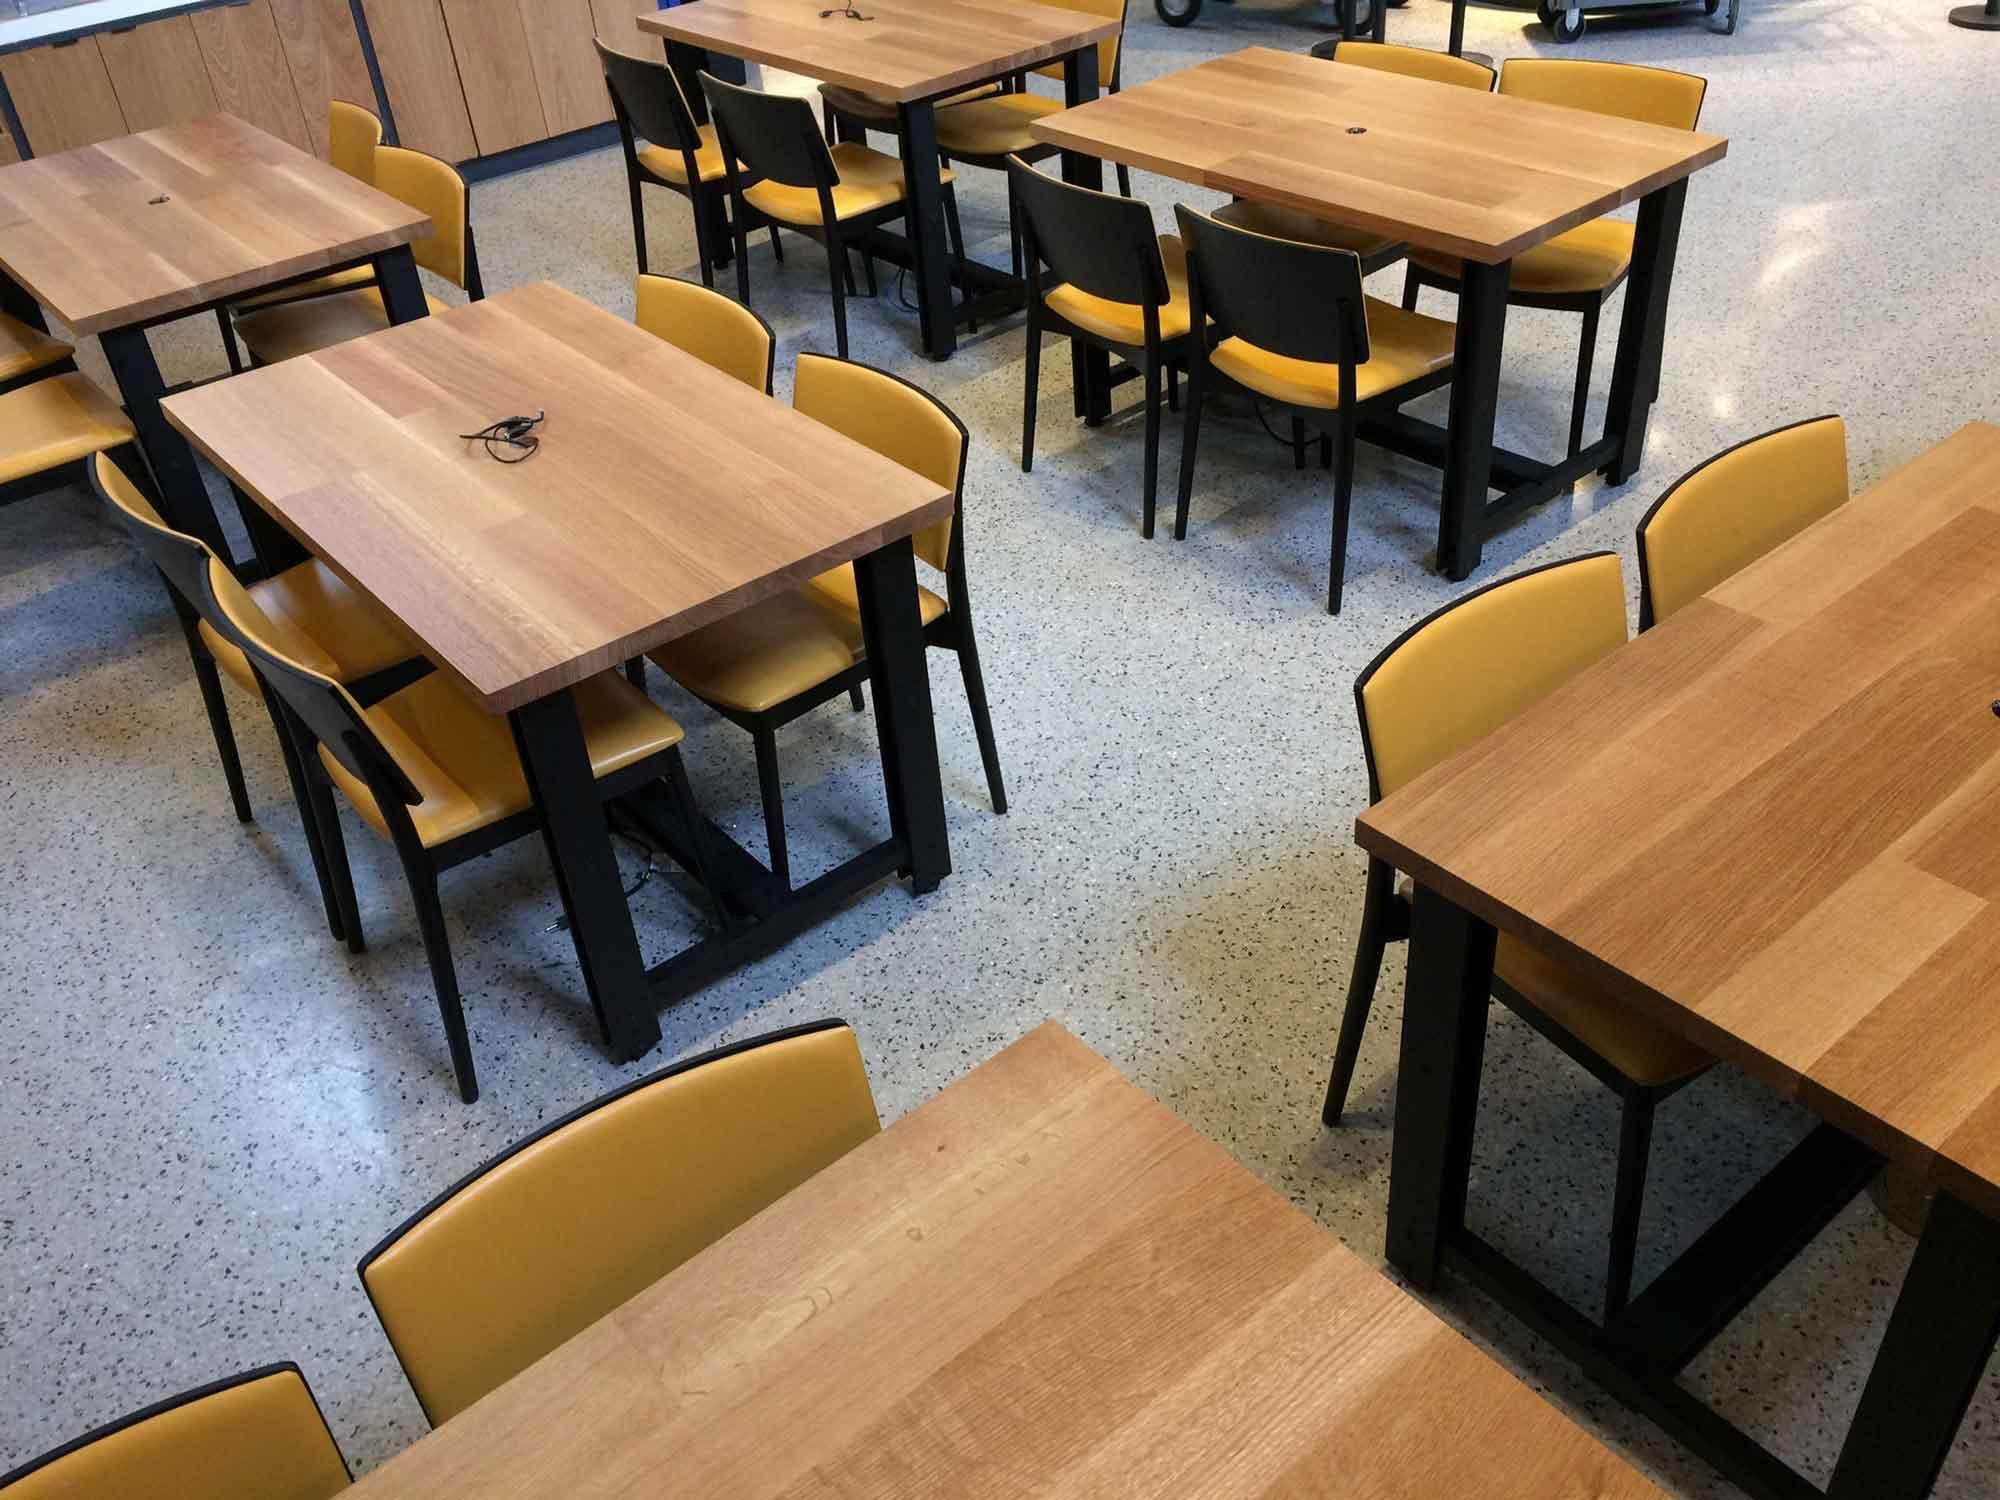 wickham-duke-ipad-tables8.jpg